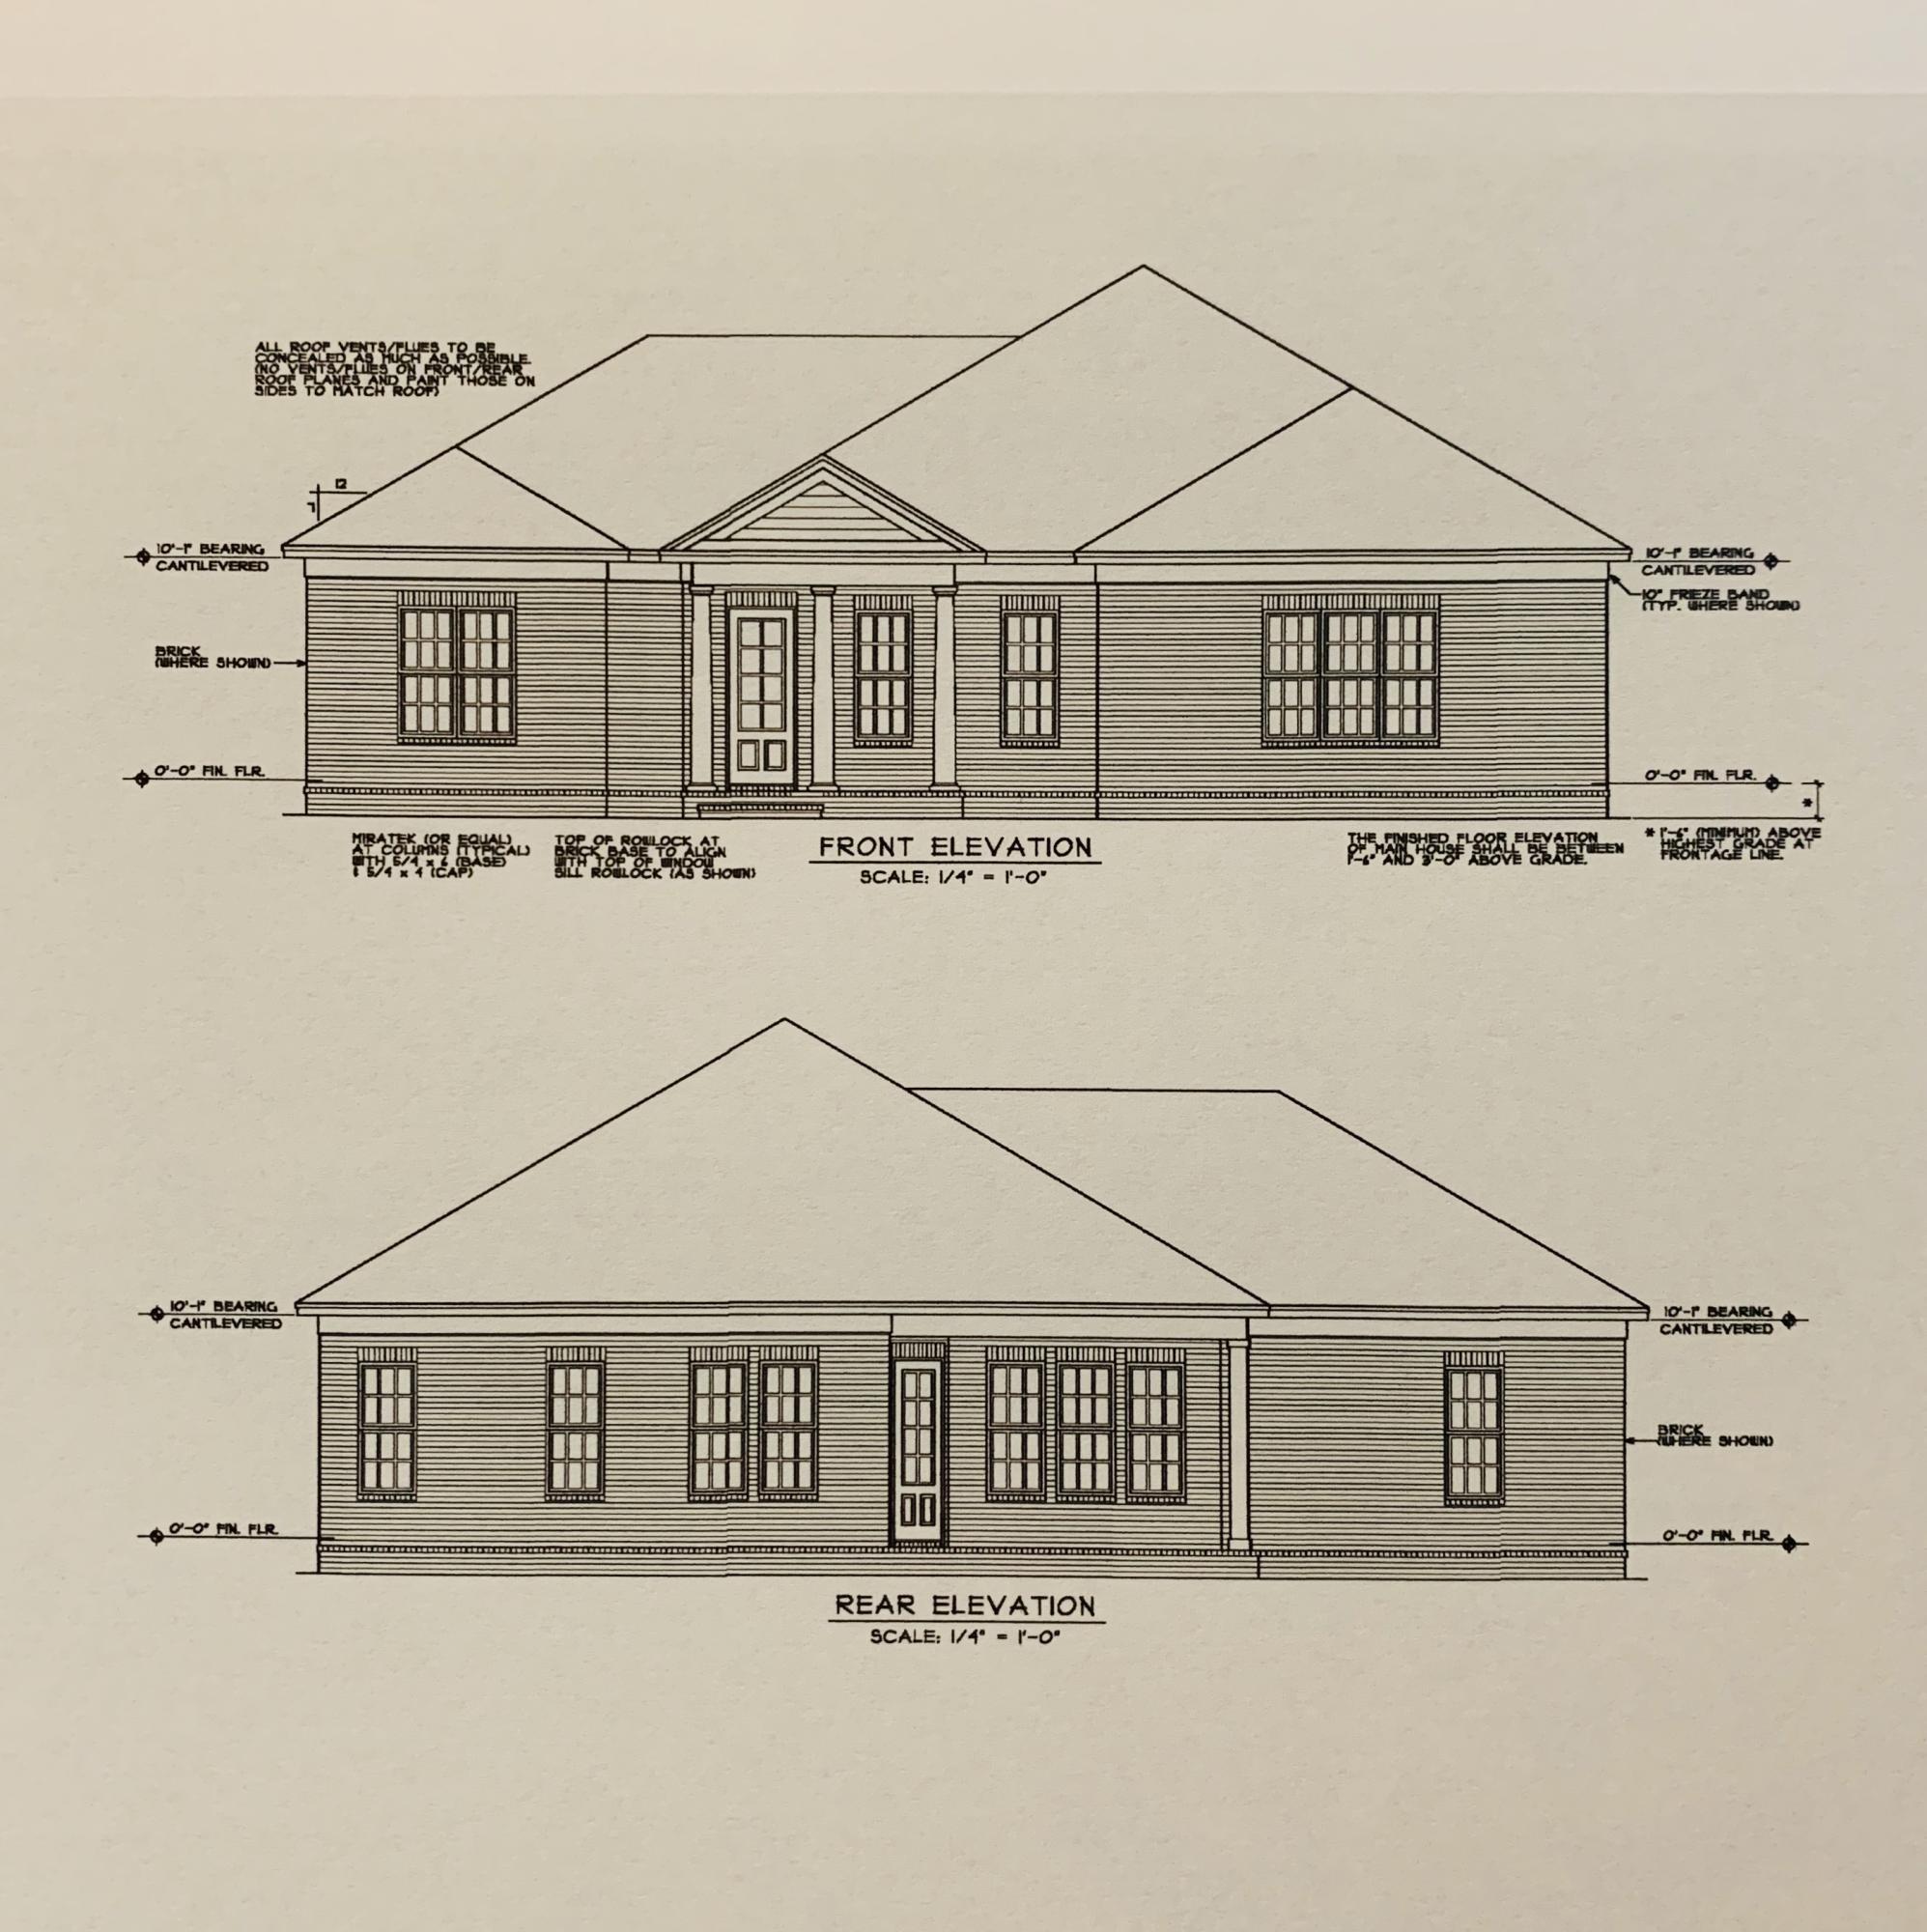 A 4 Bedroom 2 Bedroom Deer Moss Creek Phase 1a Lot 109 Home